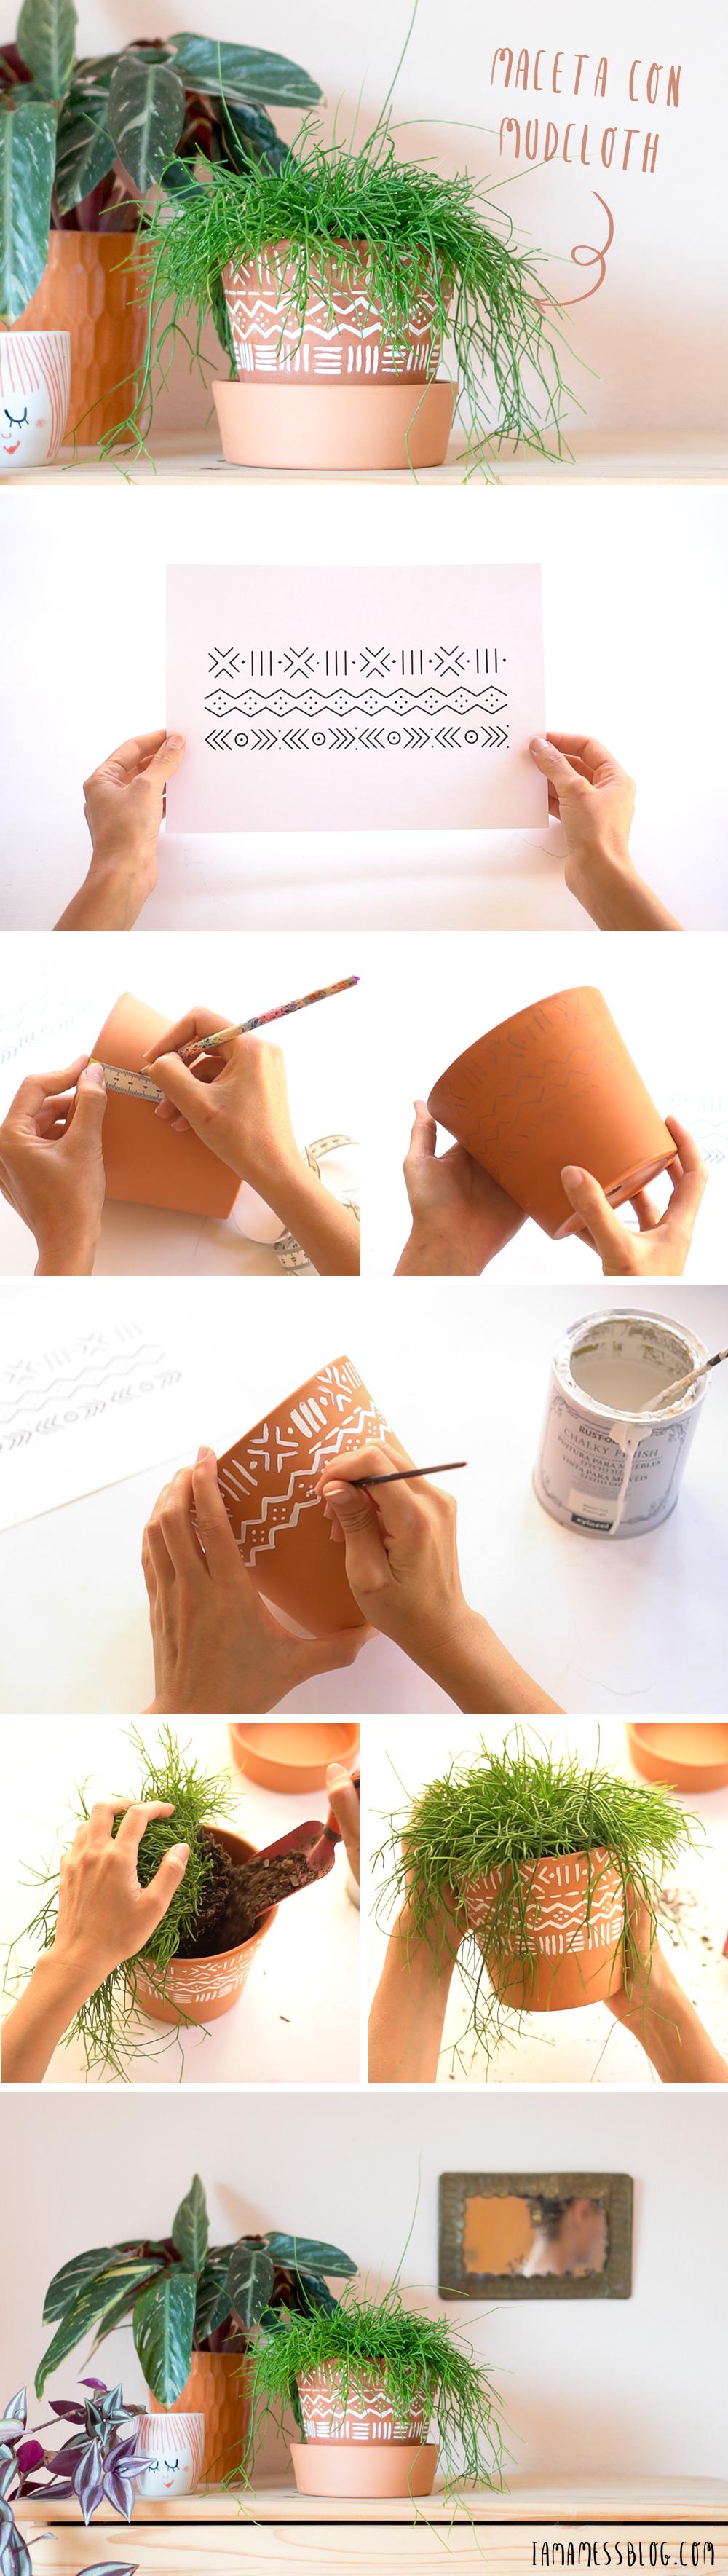 "Como pintar macetas con estampado mudcloth, visto en ""I am a Mess Blog"""